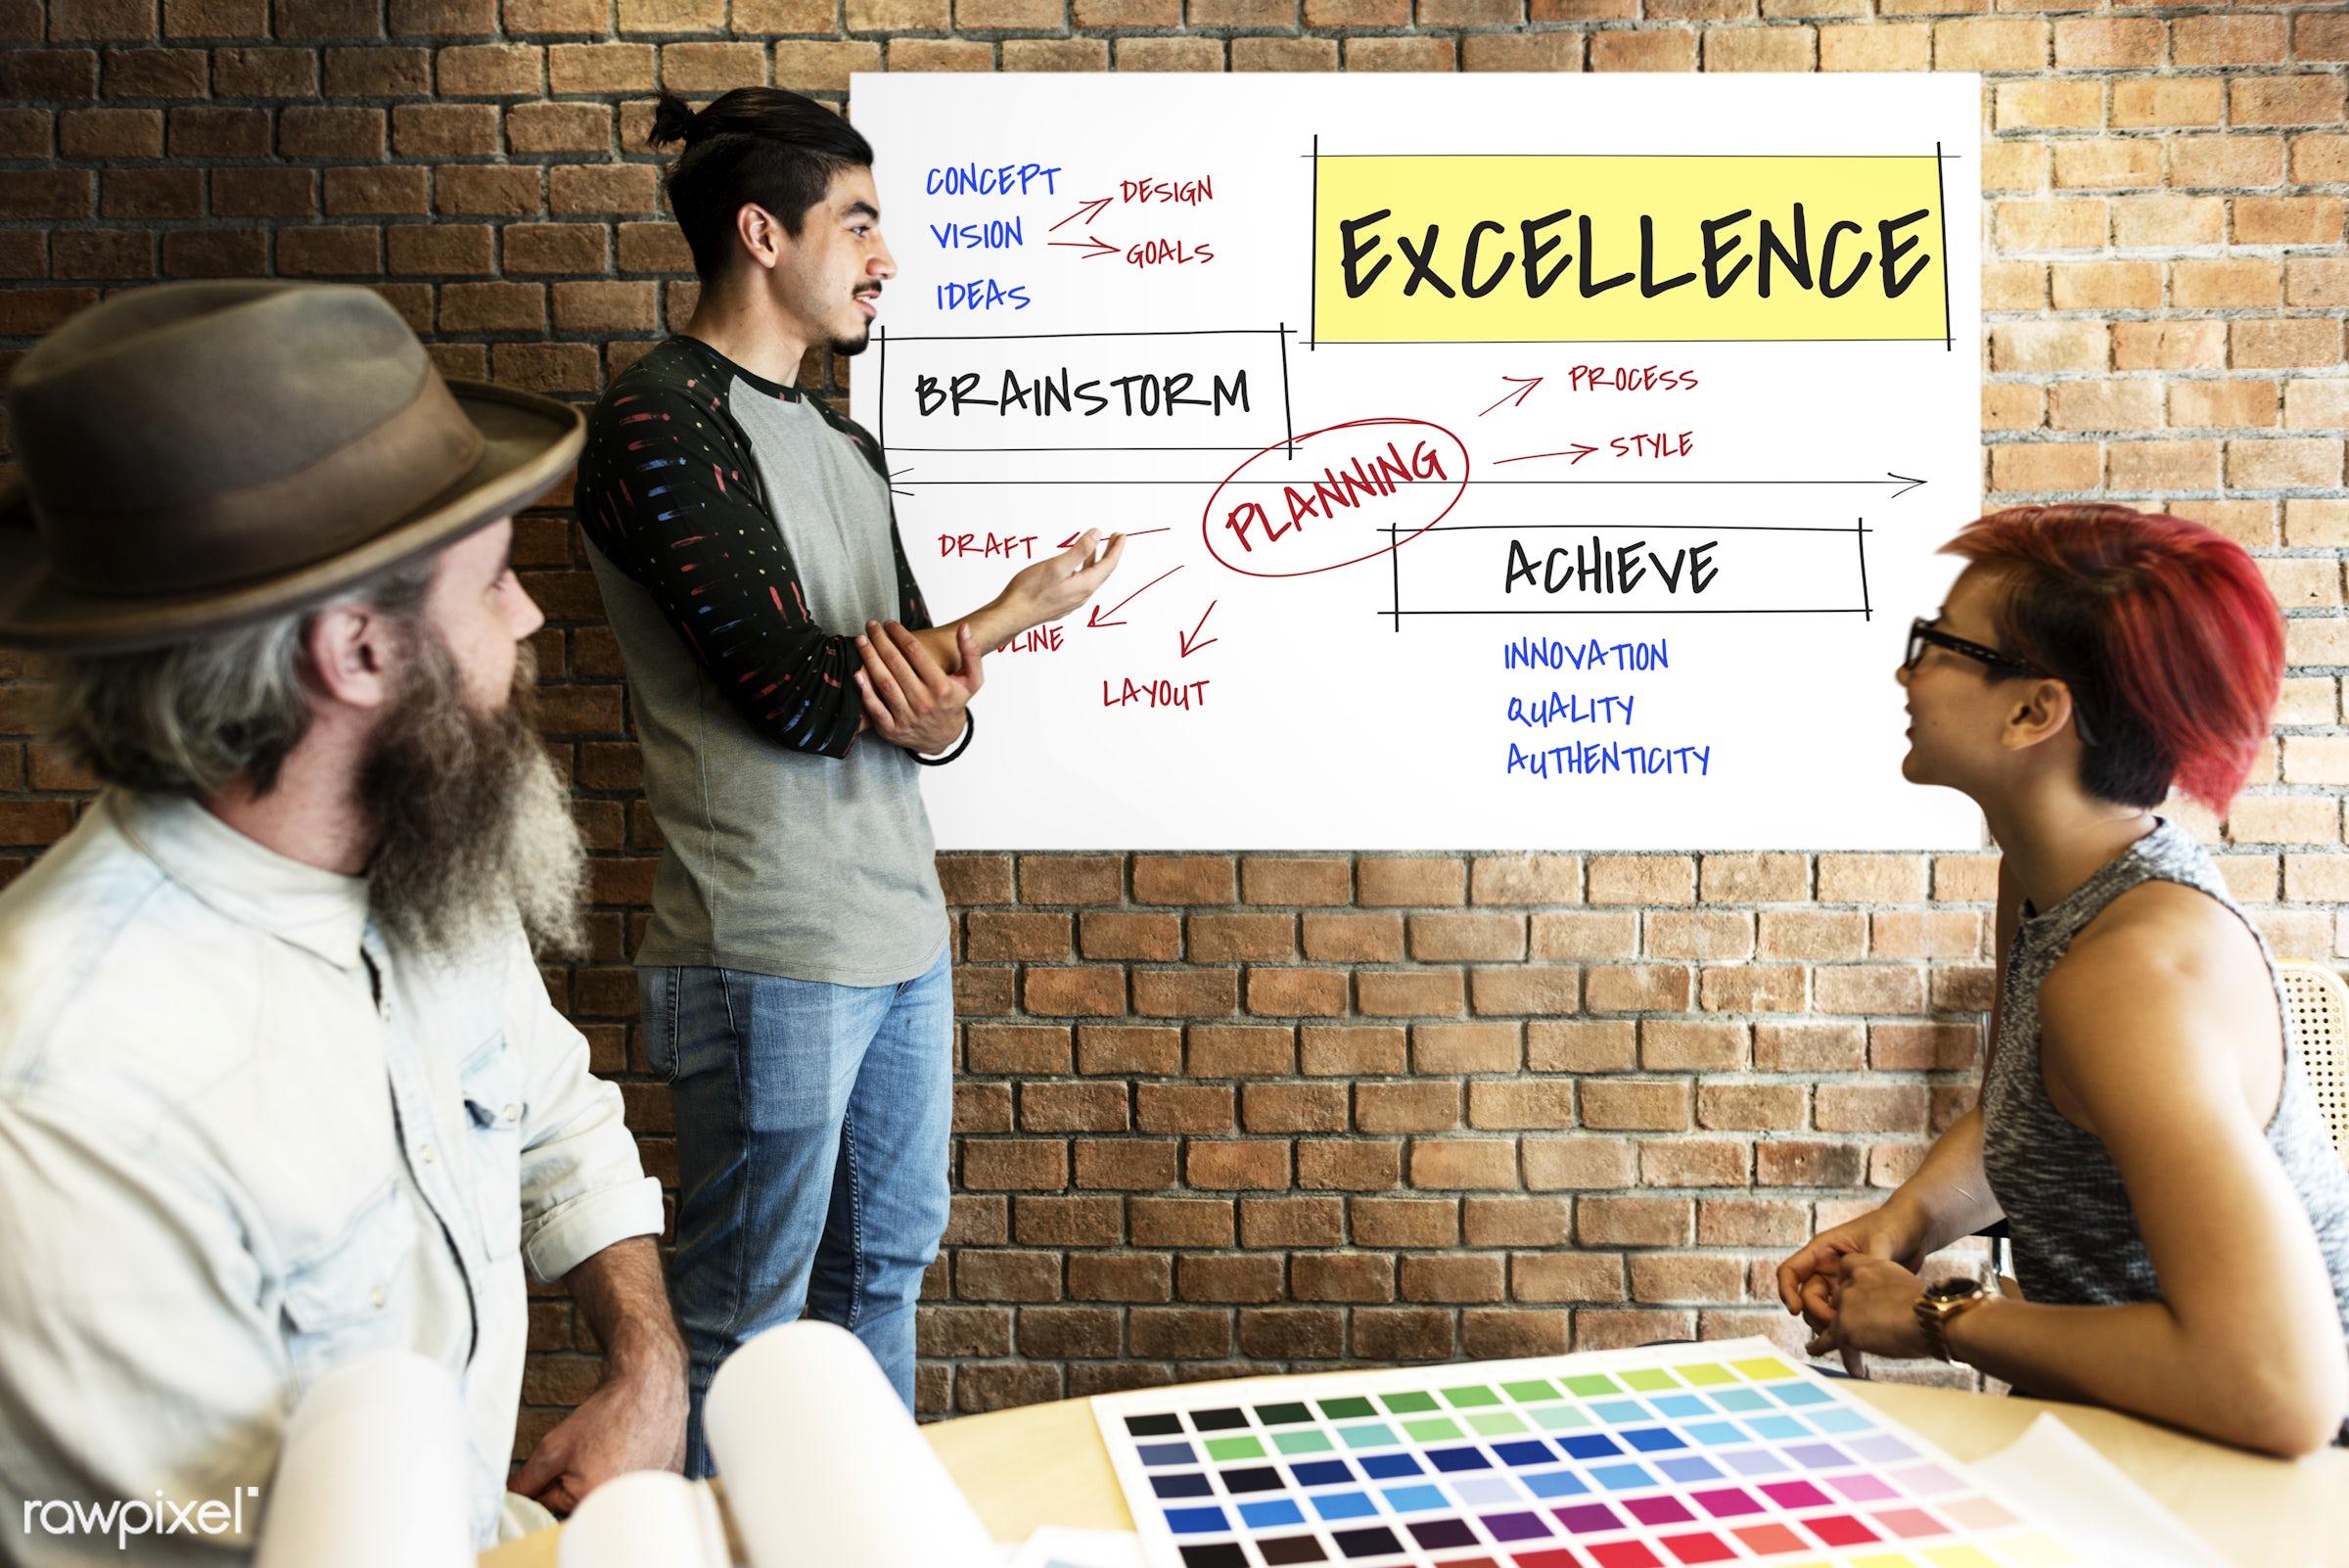 achieve, art, authenticity, be creative, beard, board, brainstorm, brick wall, chart, color chart, colors, creative,...